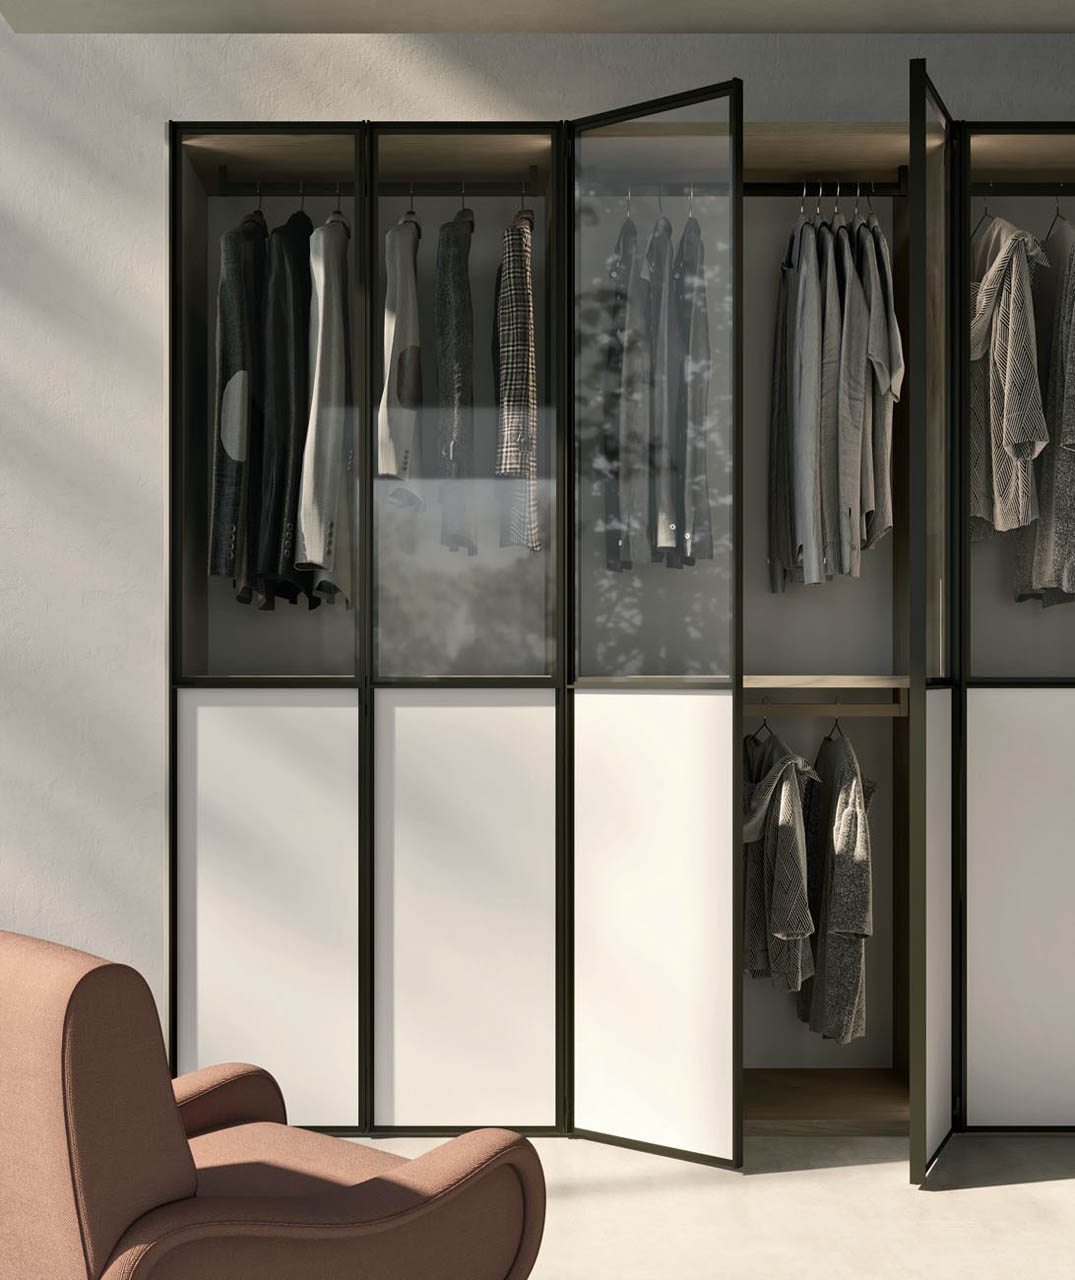 armadio-battente-anta-glass-6-orme-1092x1300 (1)